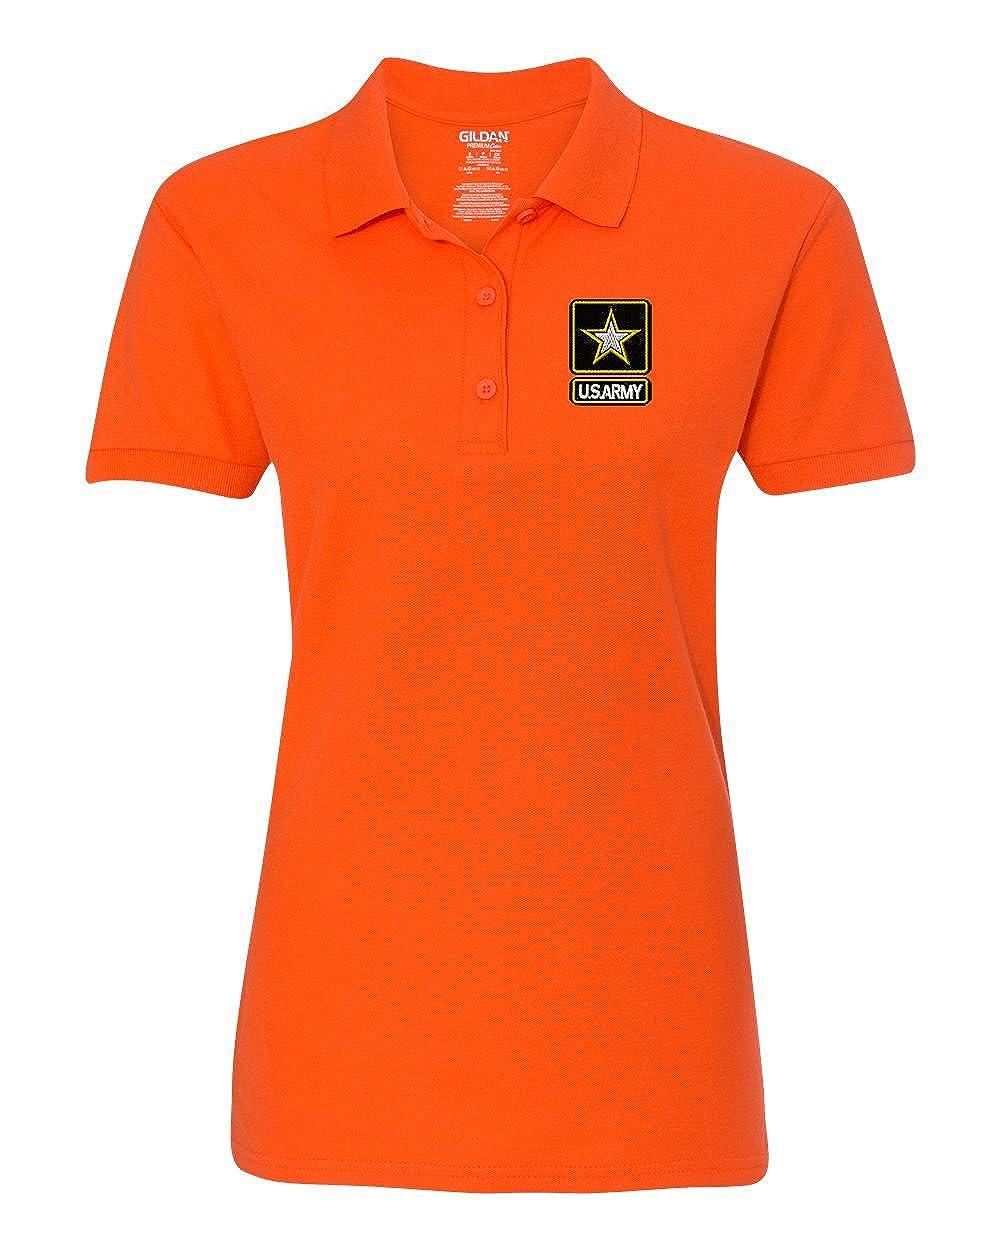 Unlimited Embroidery SHIRT レディース B071S4PYMN XL|オレンジ オレンジ XL